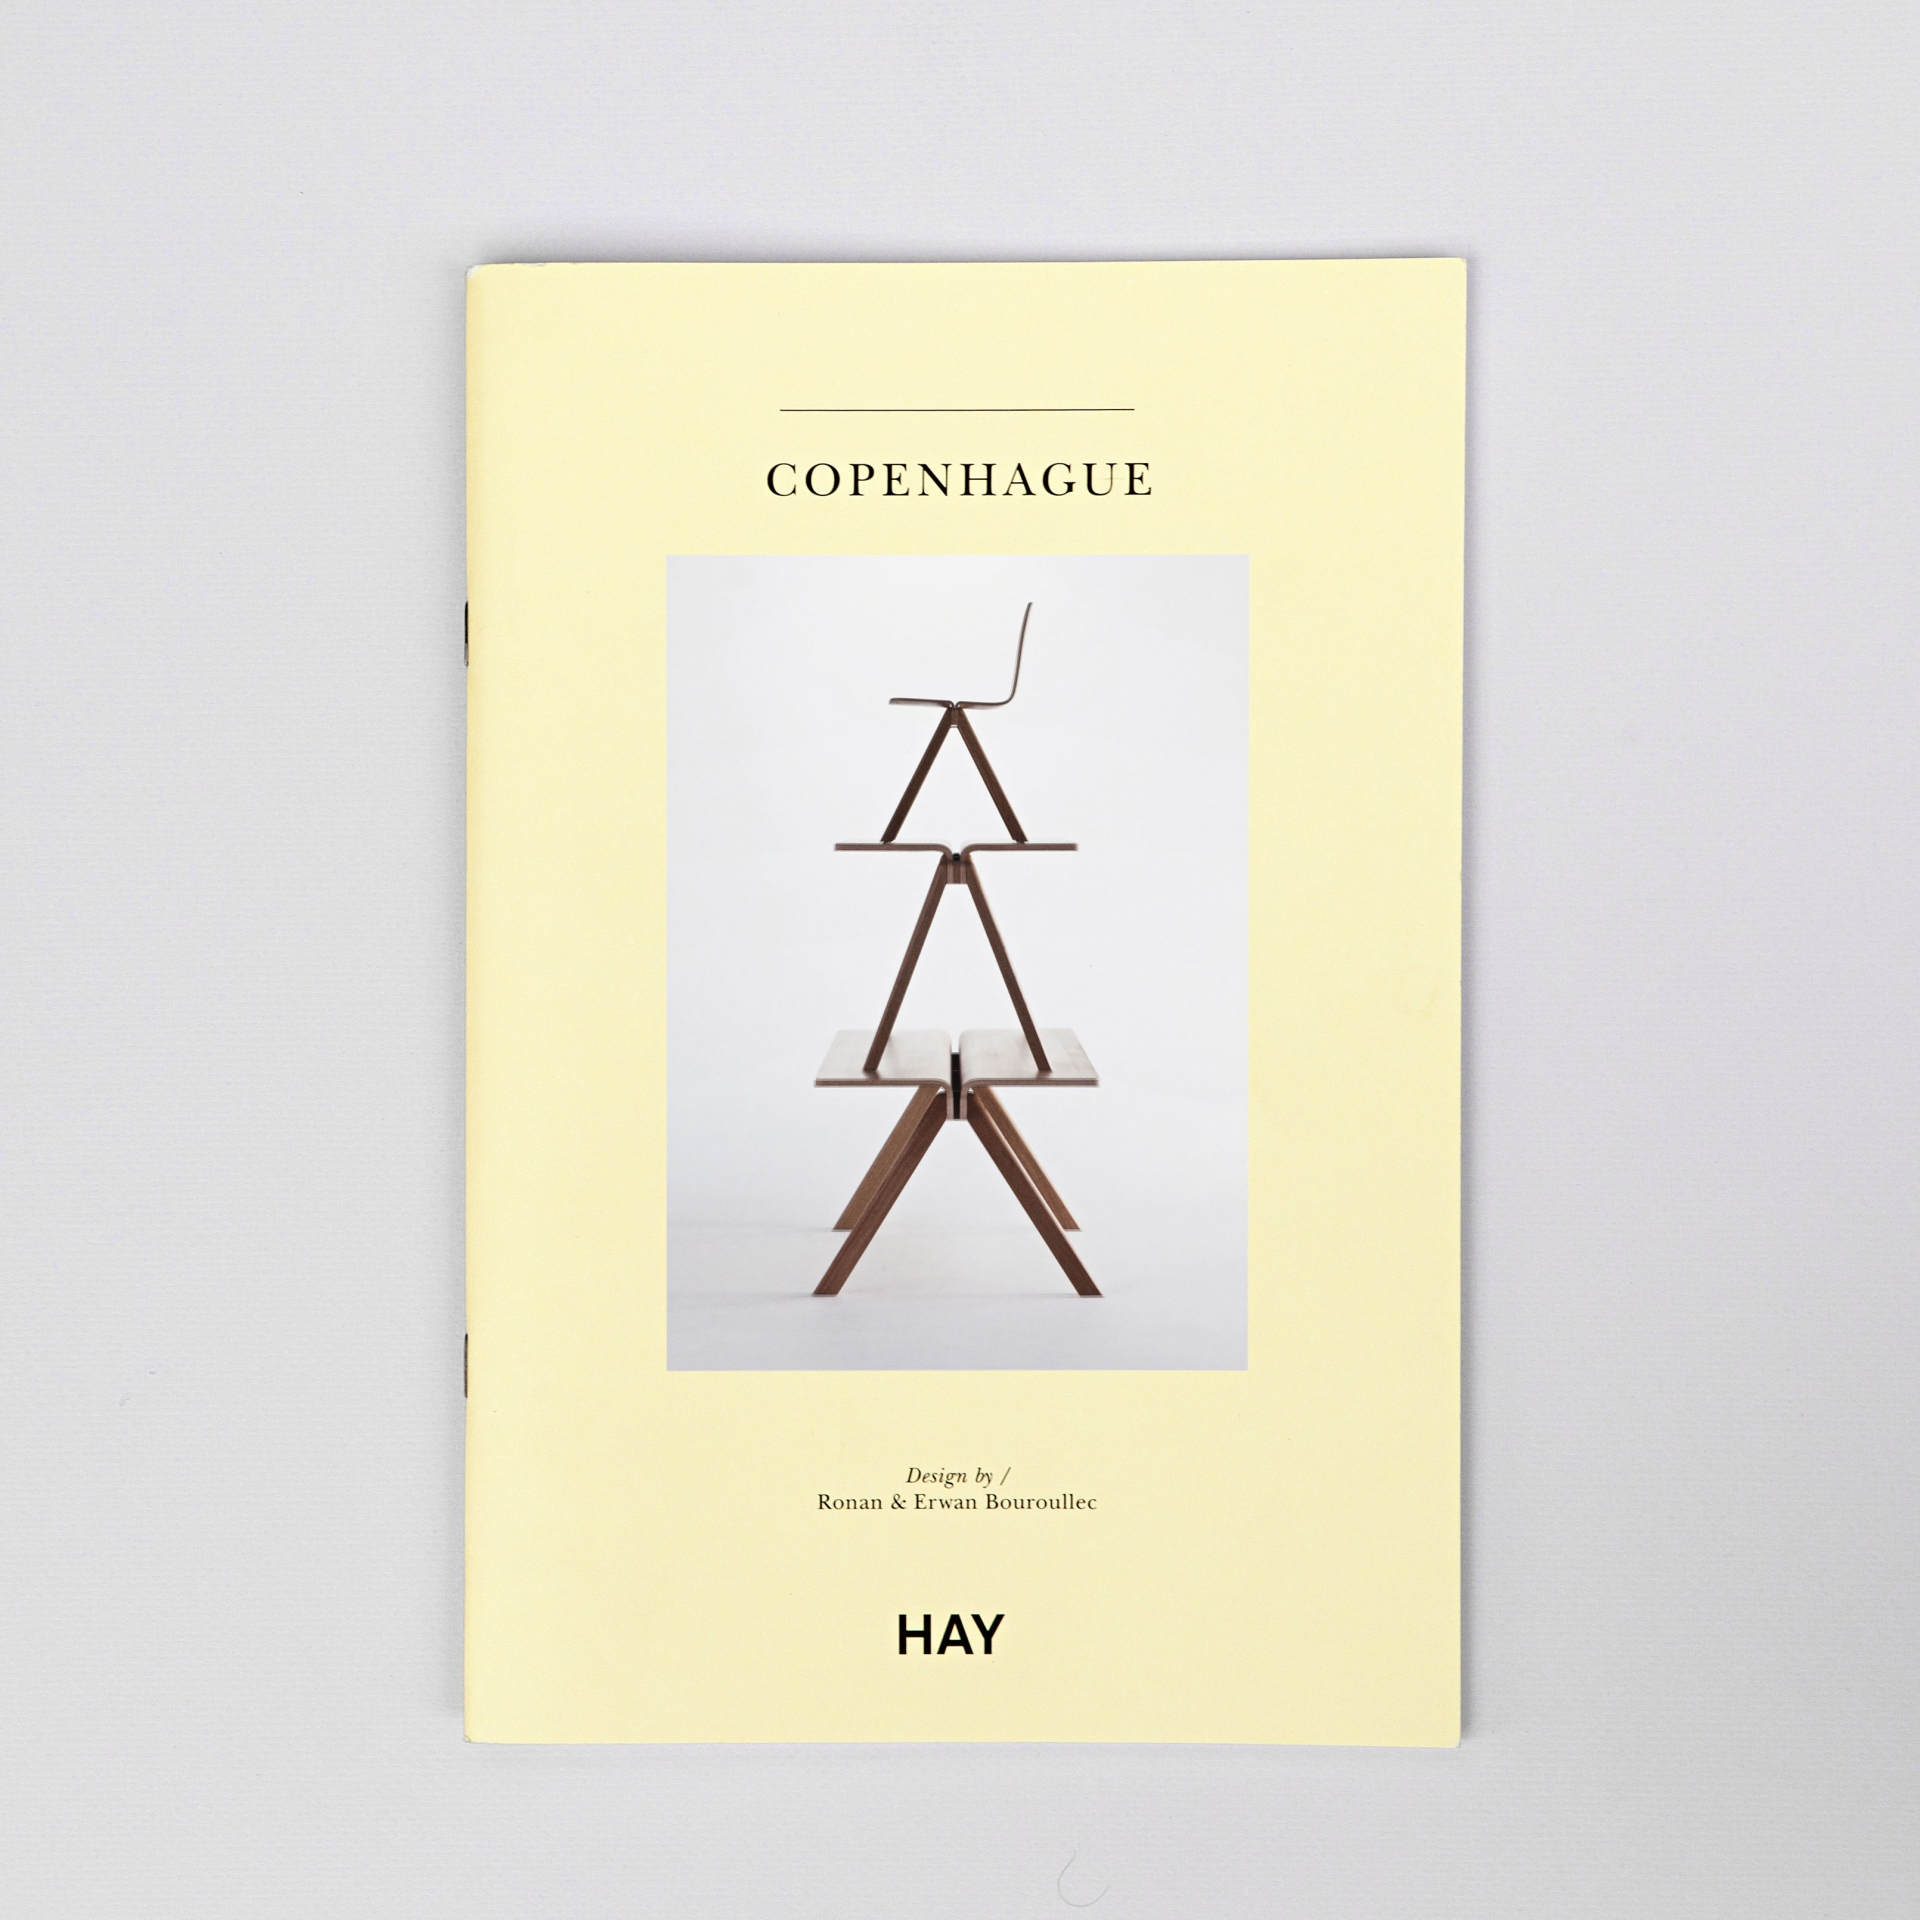 COPENHAGUE / HAY